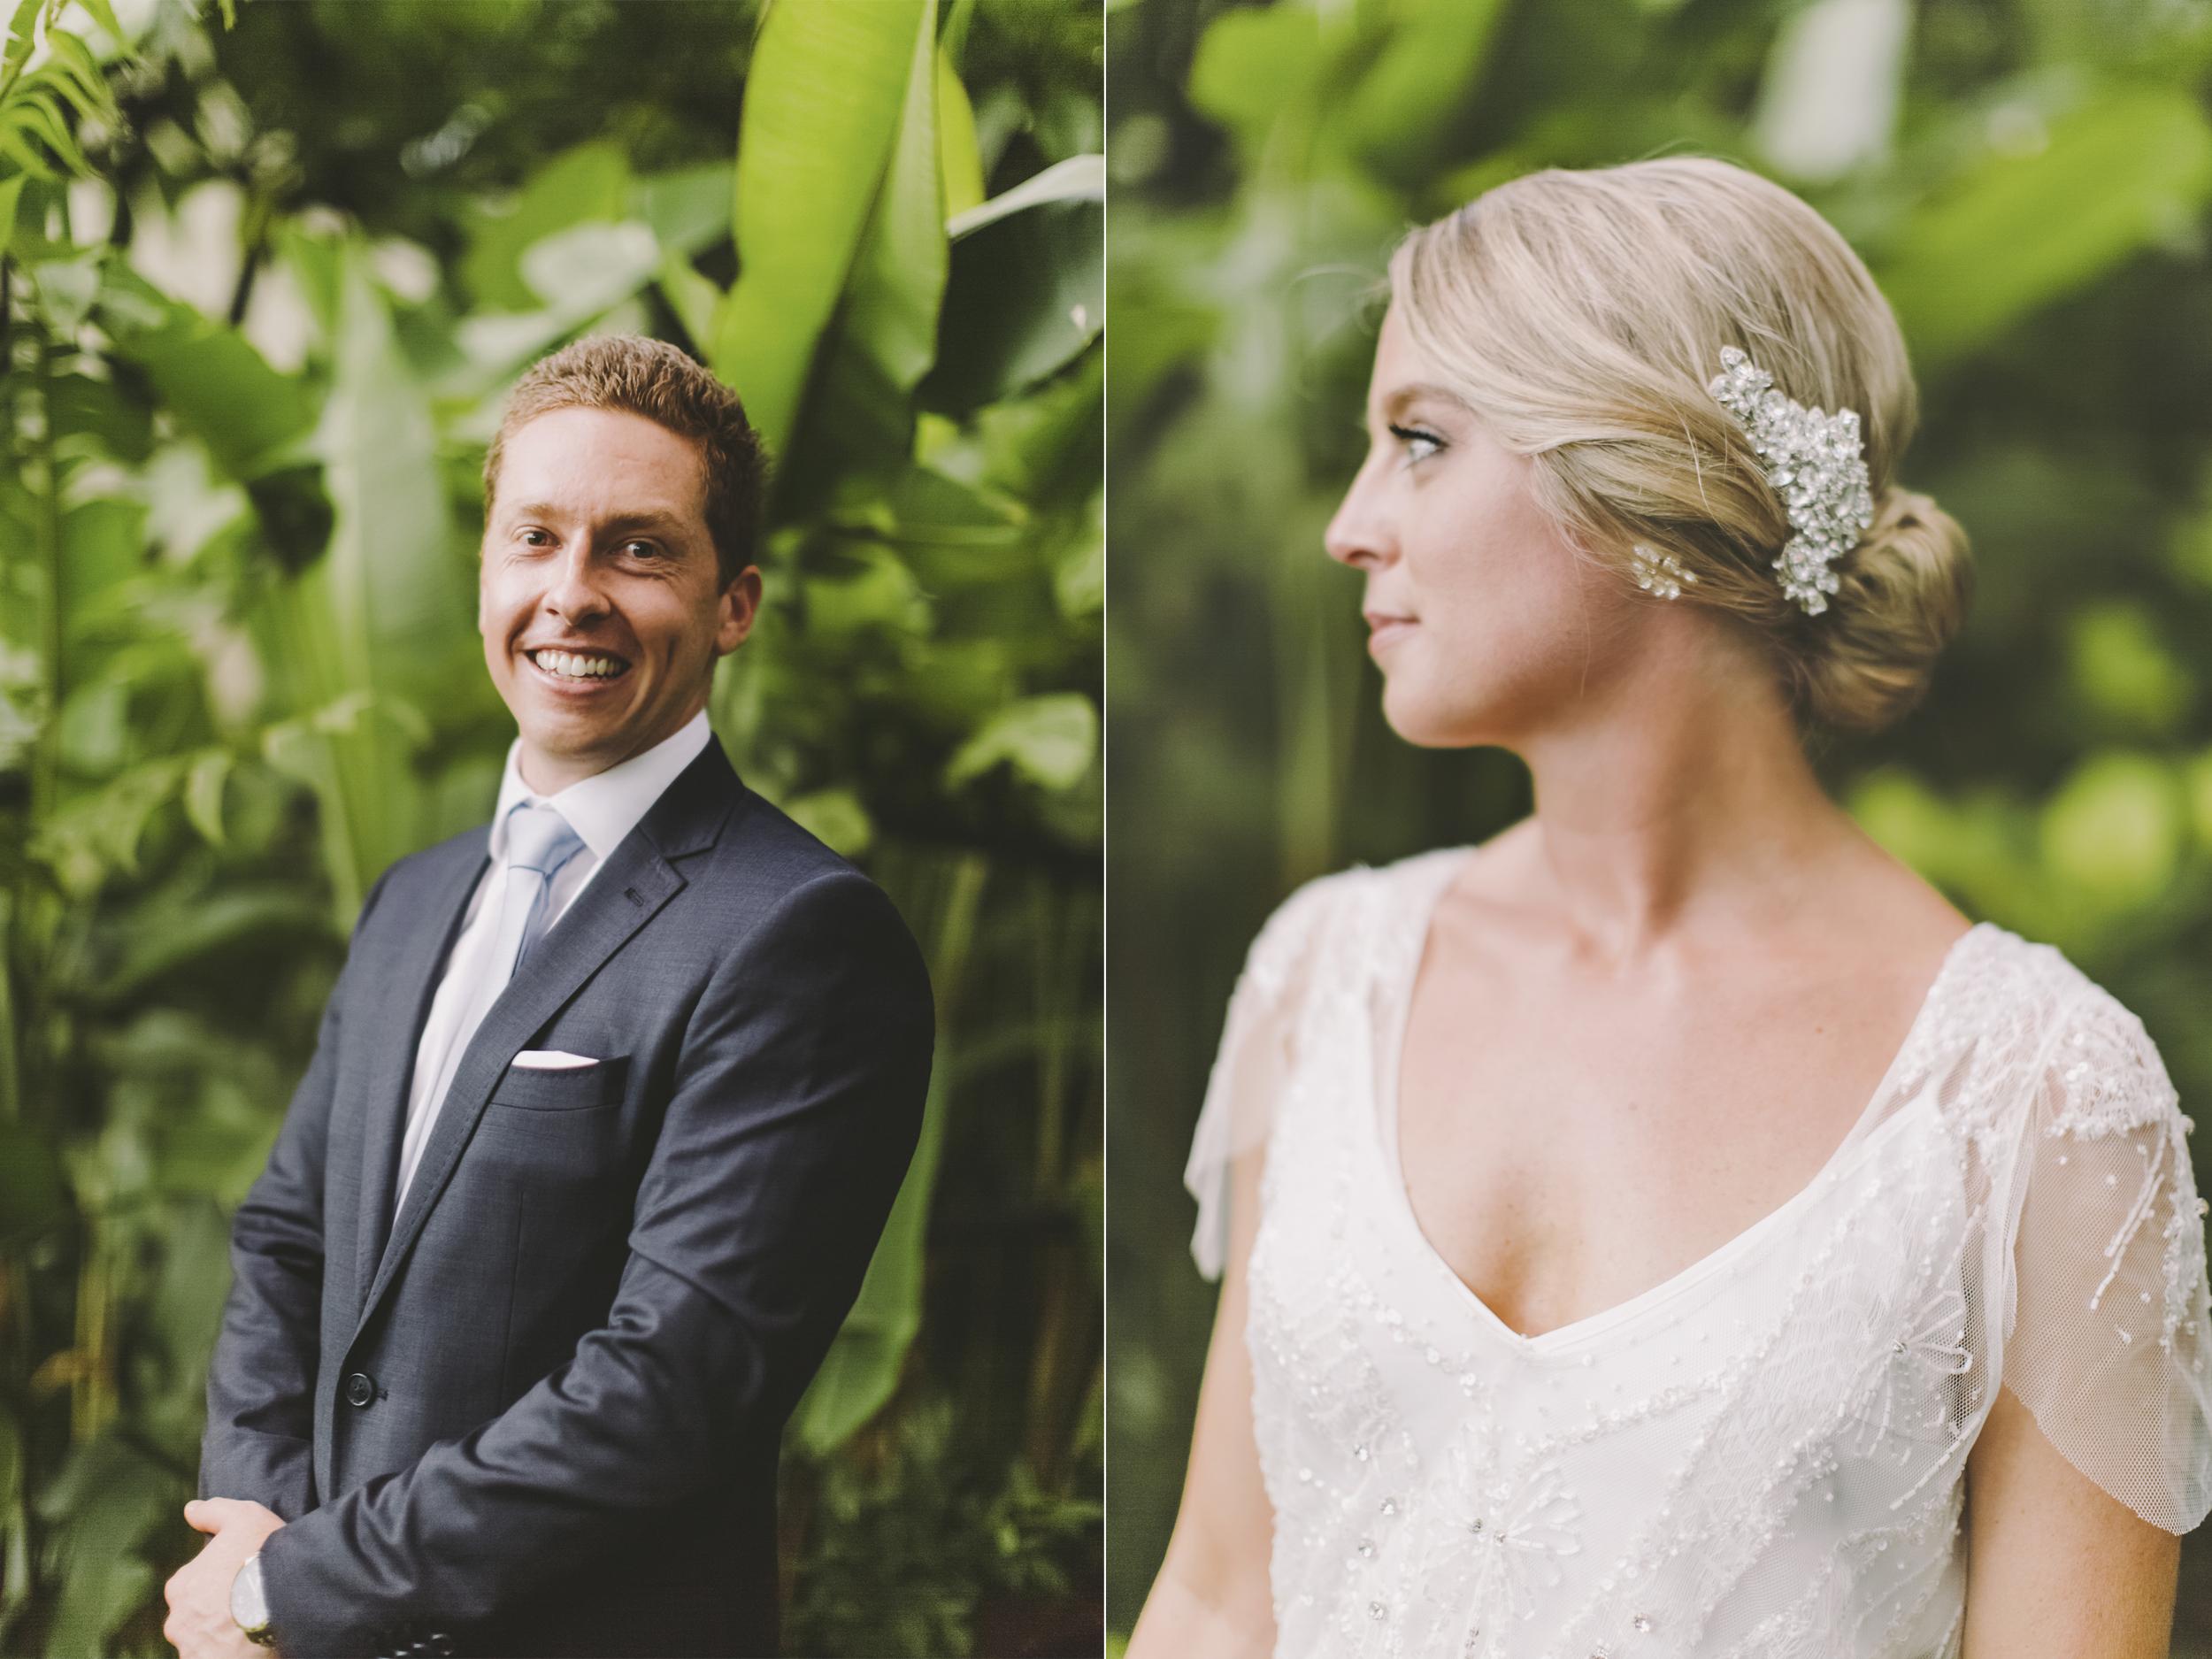 angie-diaz-photography-maui-wedding-mel-matt-94.jpg